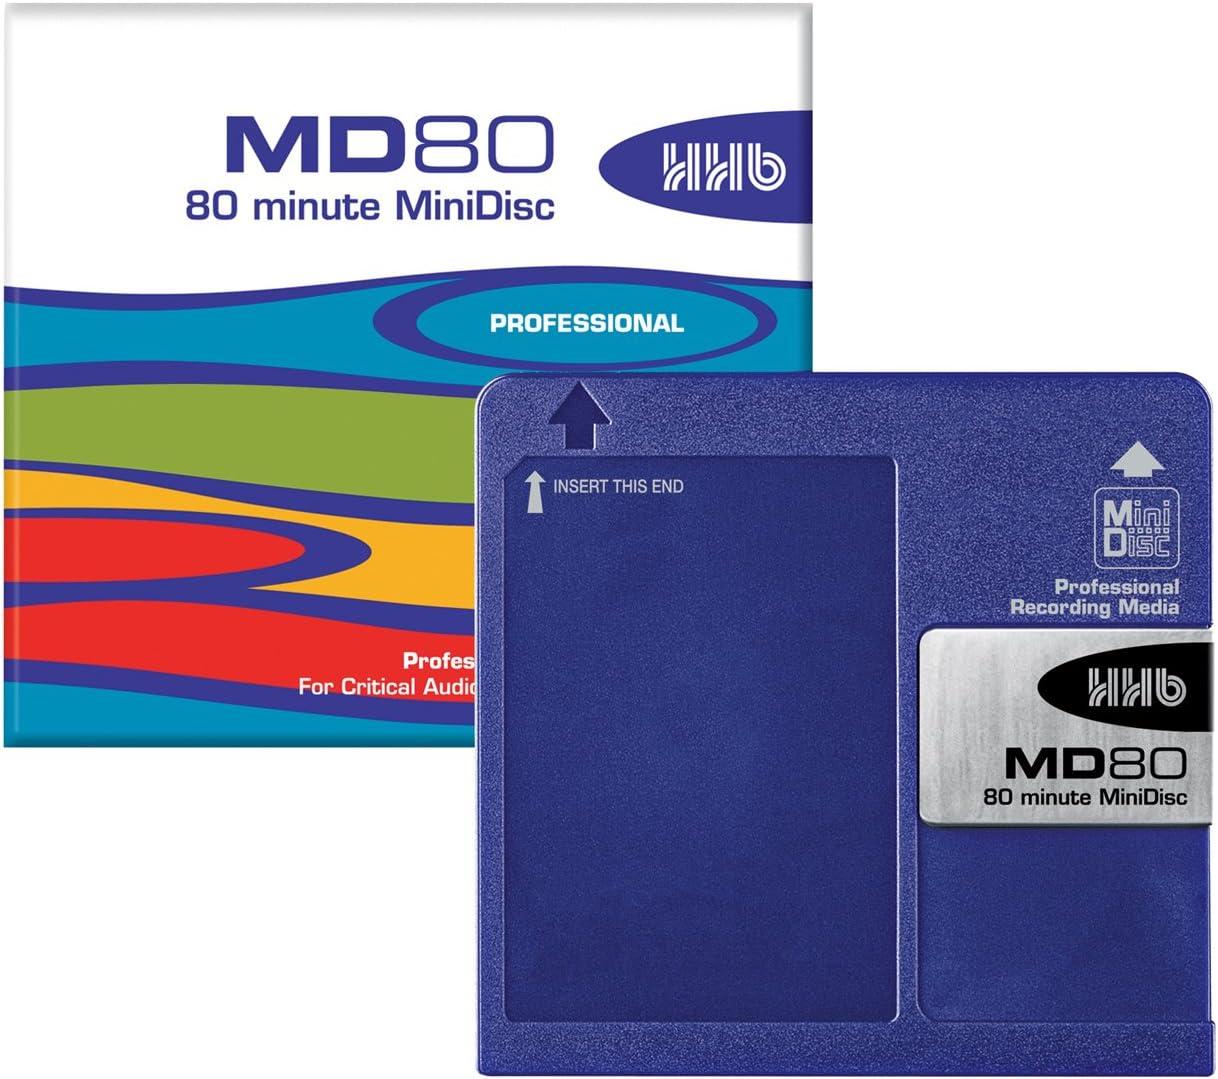 HHB MD80 80 Minute MiniDisc (5 Pack)